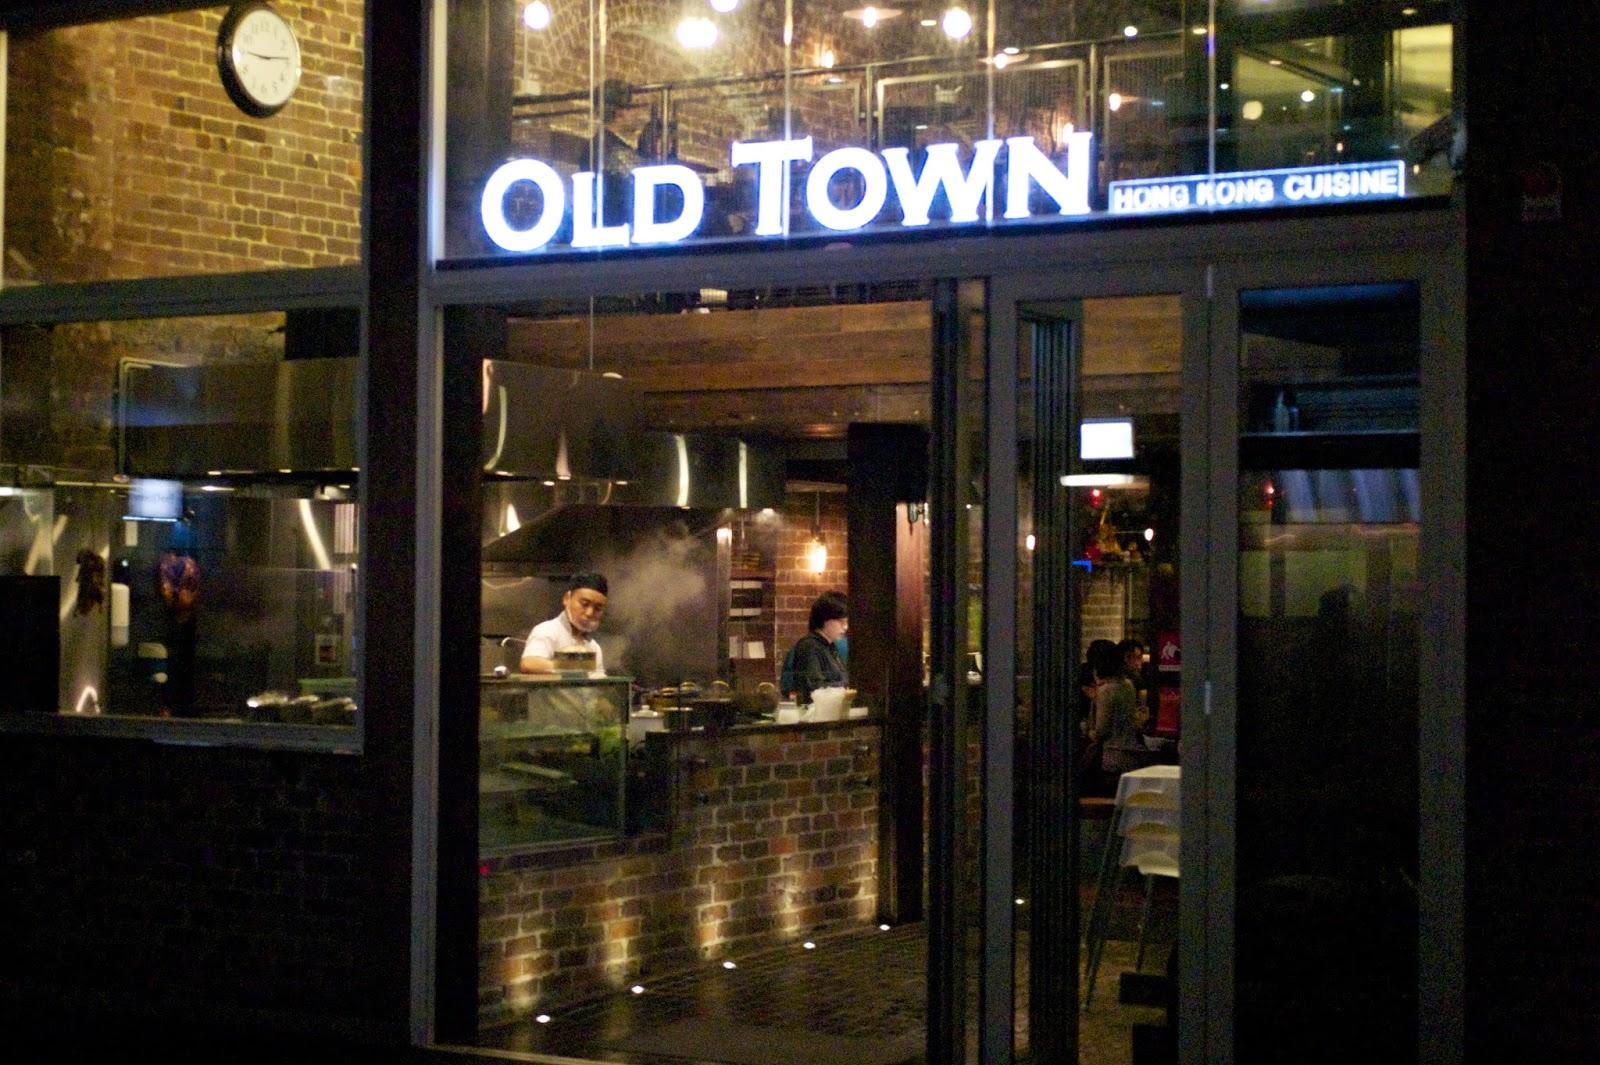 Old town restaurant hong kong cuisine 10 dixon st chinatown haymarket sydney